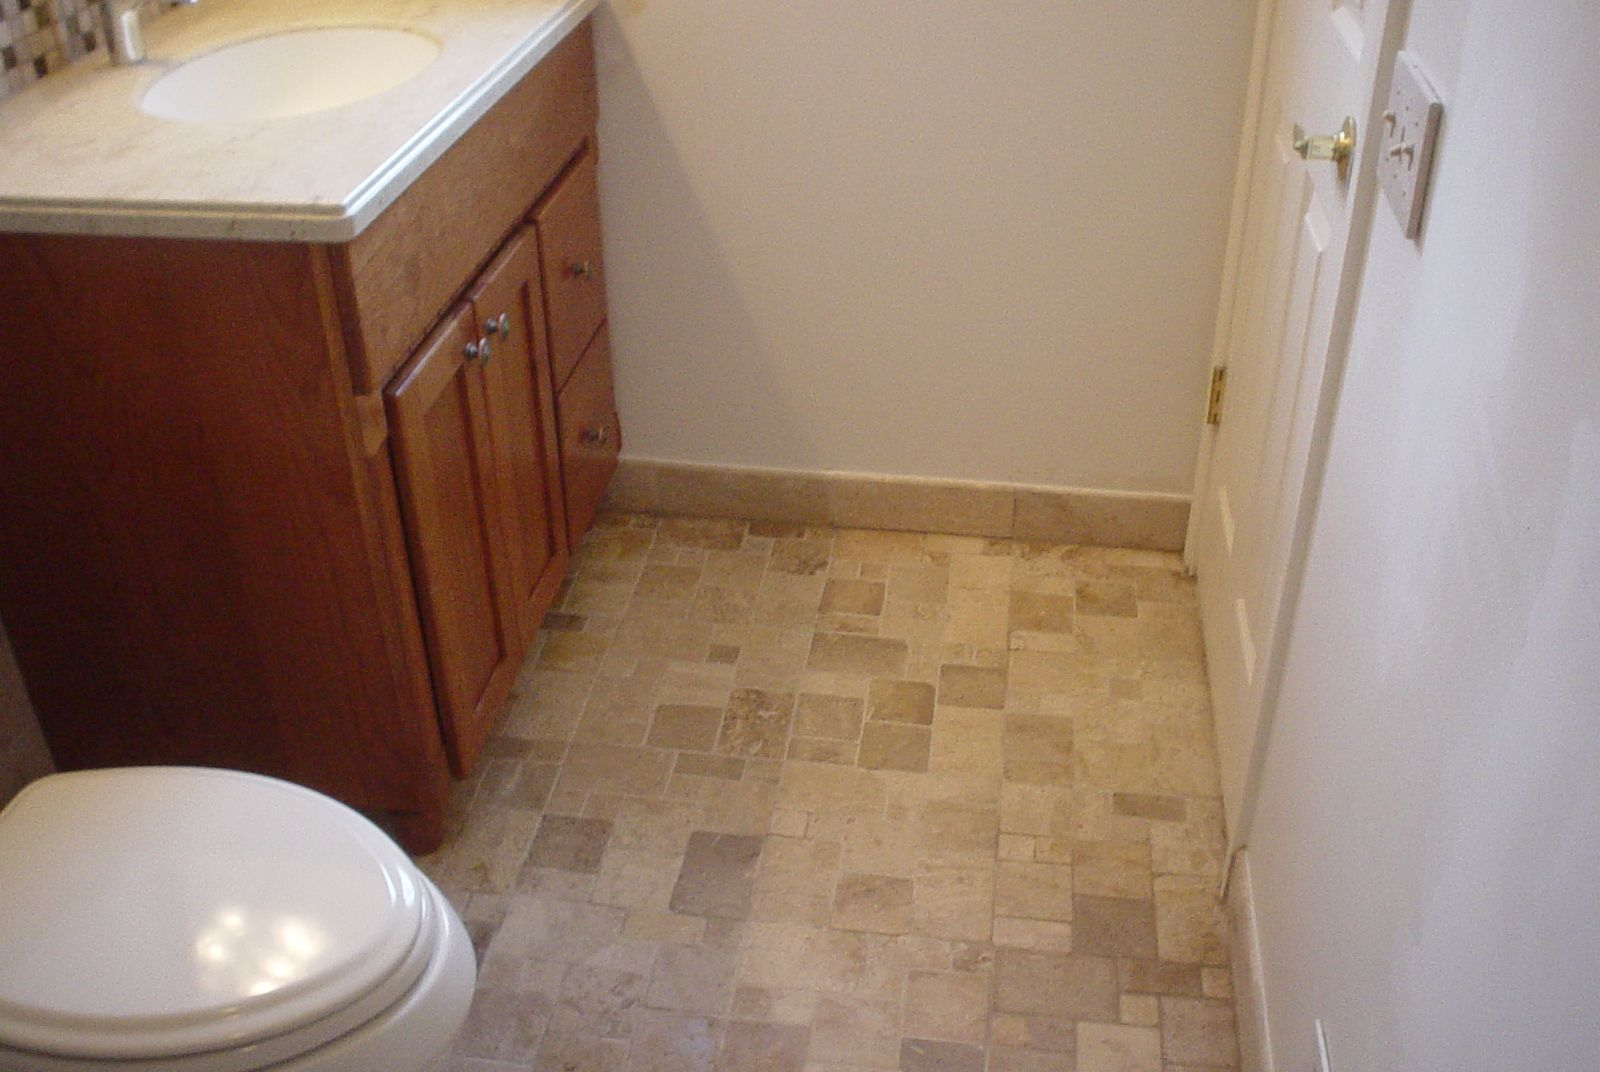 New vanity and new tile floor